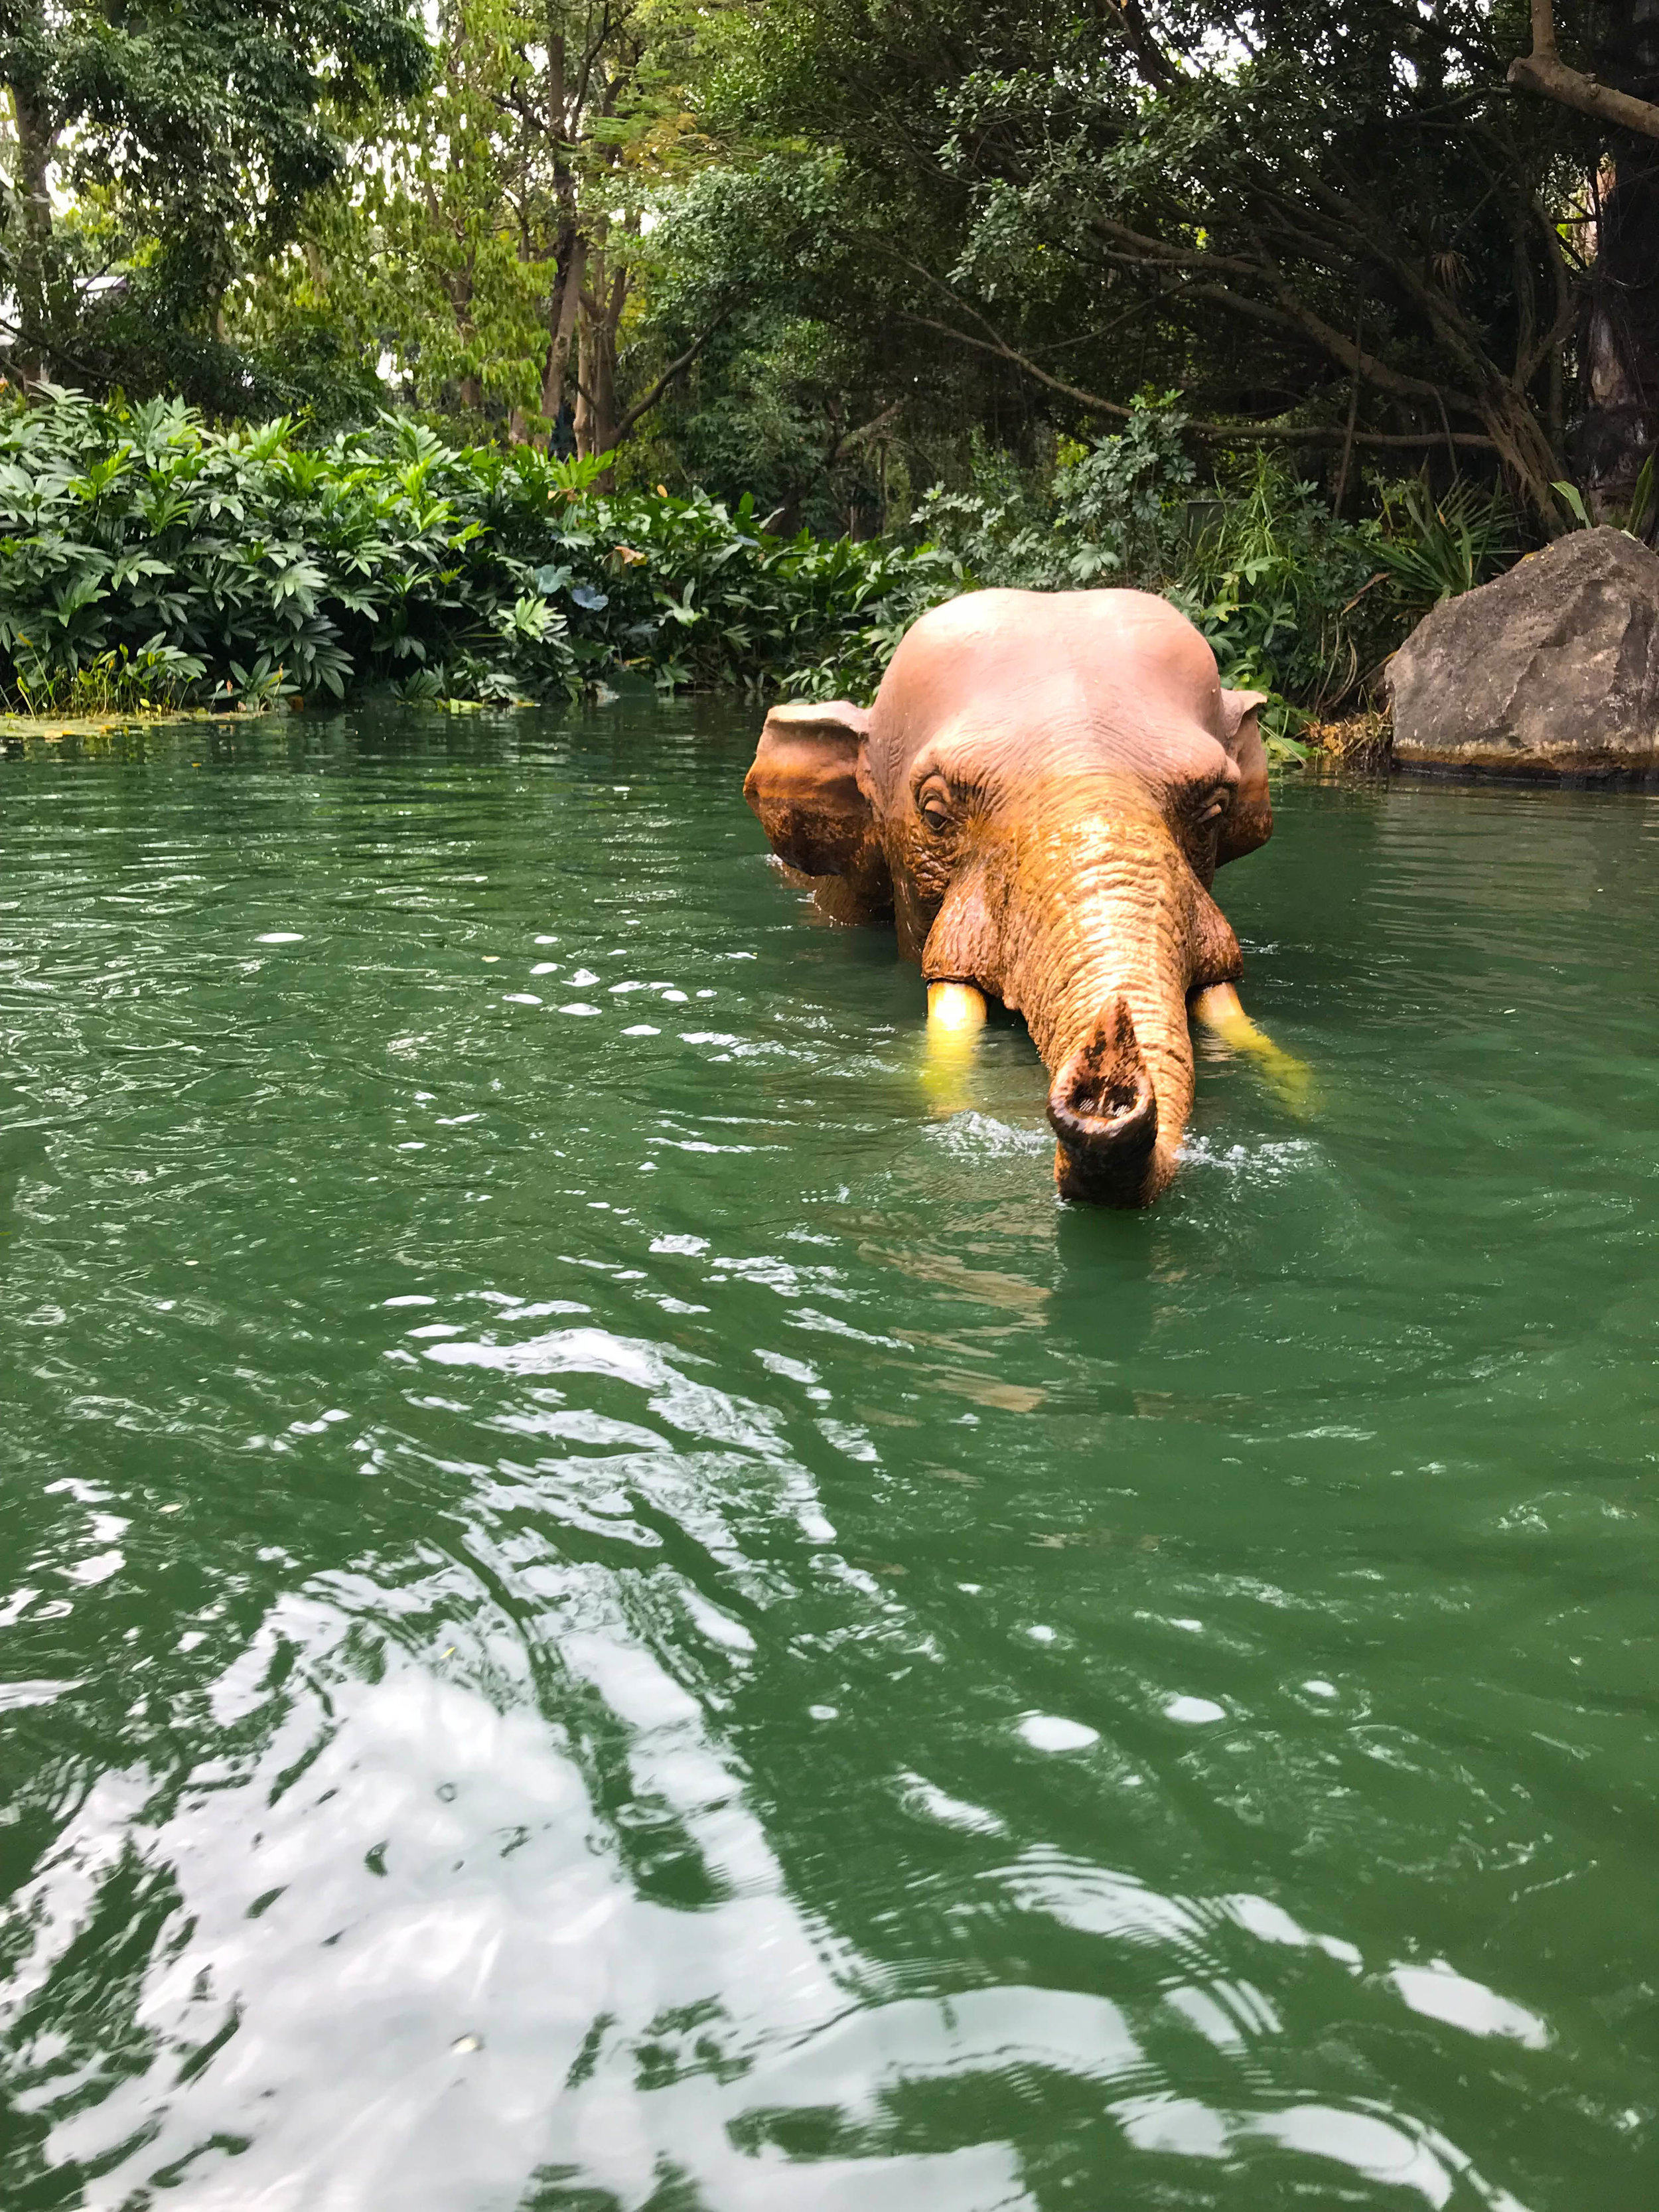 Hong Kong Disneyland - Adventureland Jungle Cruise Elephant